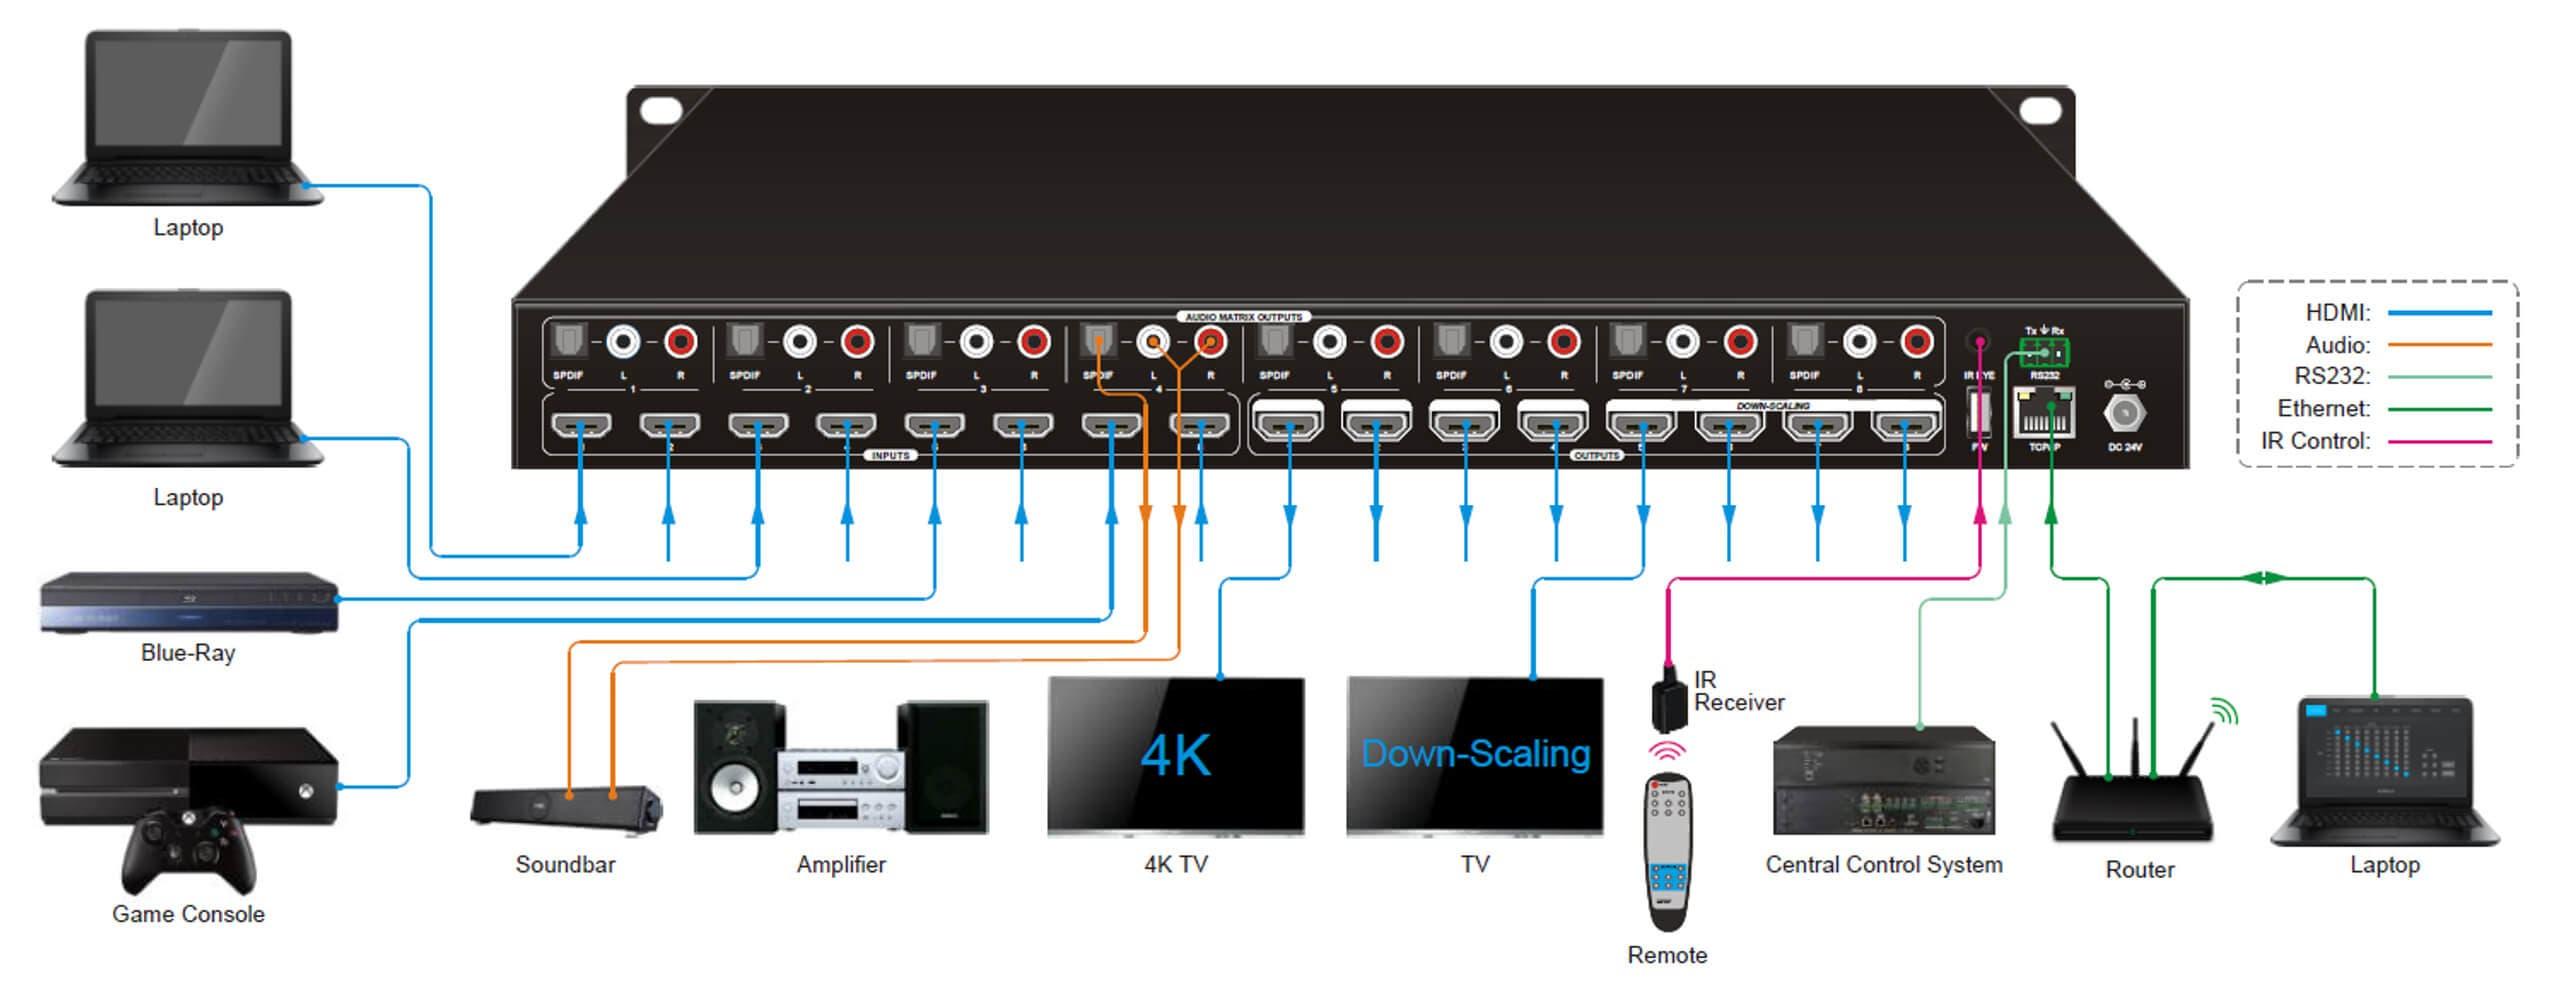 monoprice blackbird 4k 8x8 hdmi matrix switch with hdmi 2